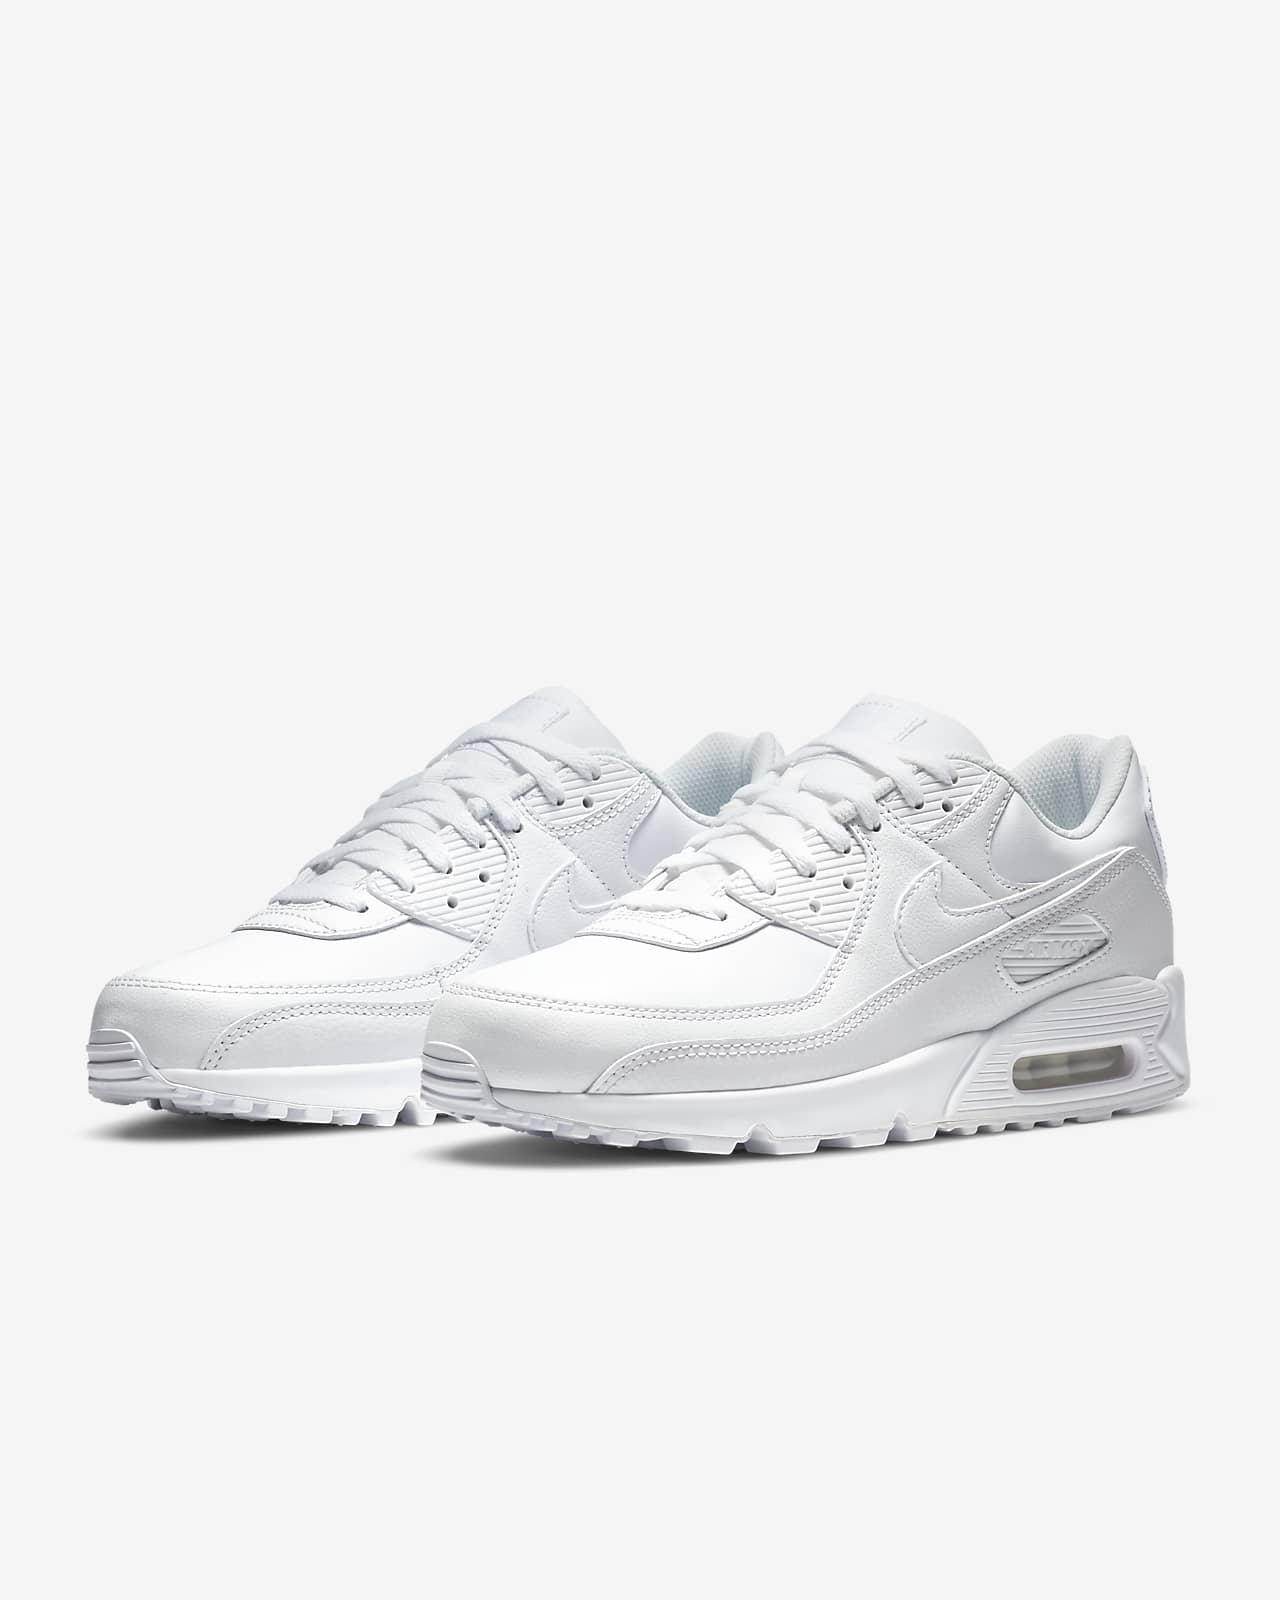 Chaussure Air Max 90 LTR pour Homme